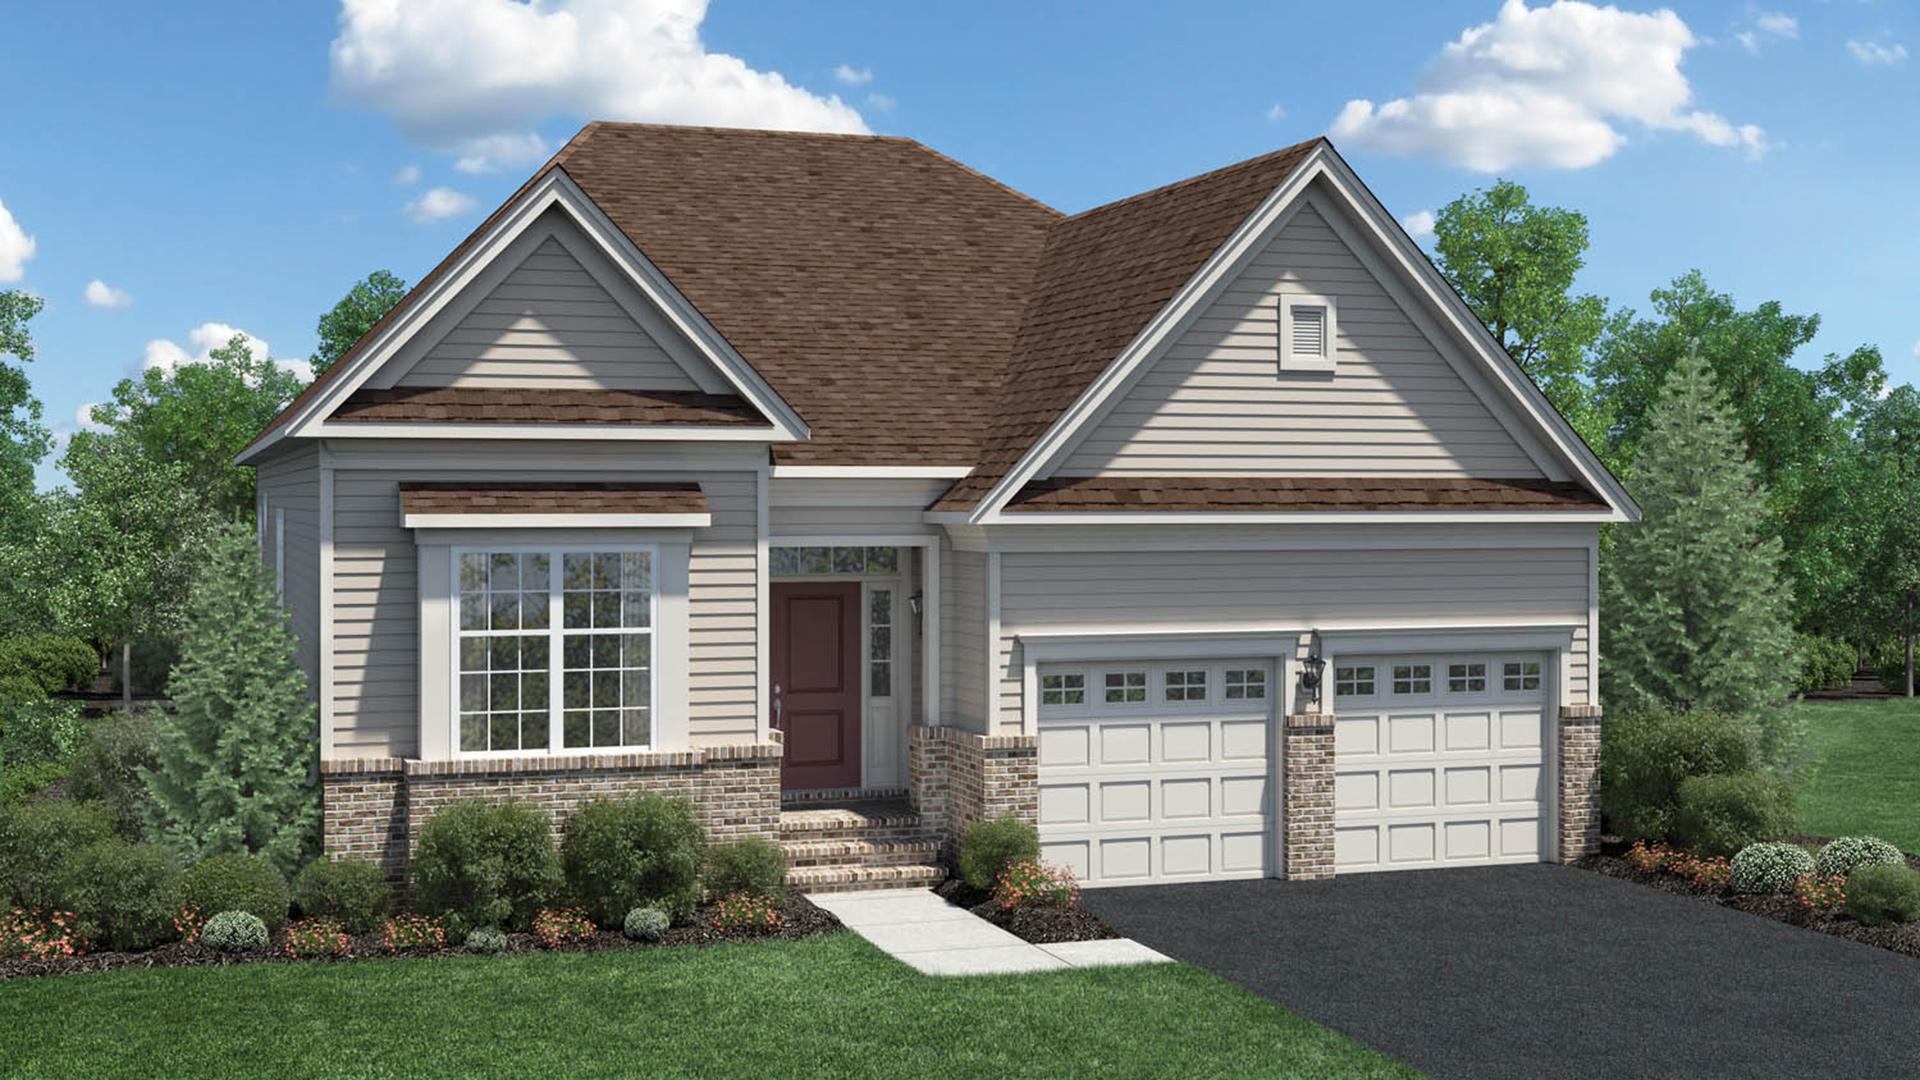 Meadow Glen at Skippack | The Binghamton Home Design